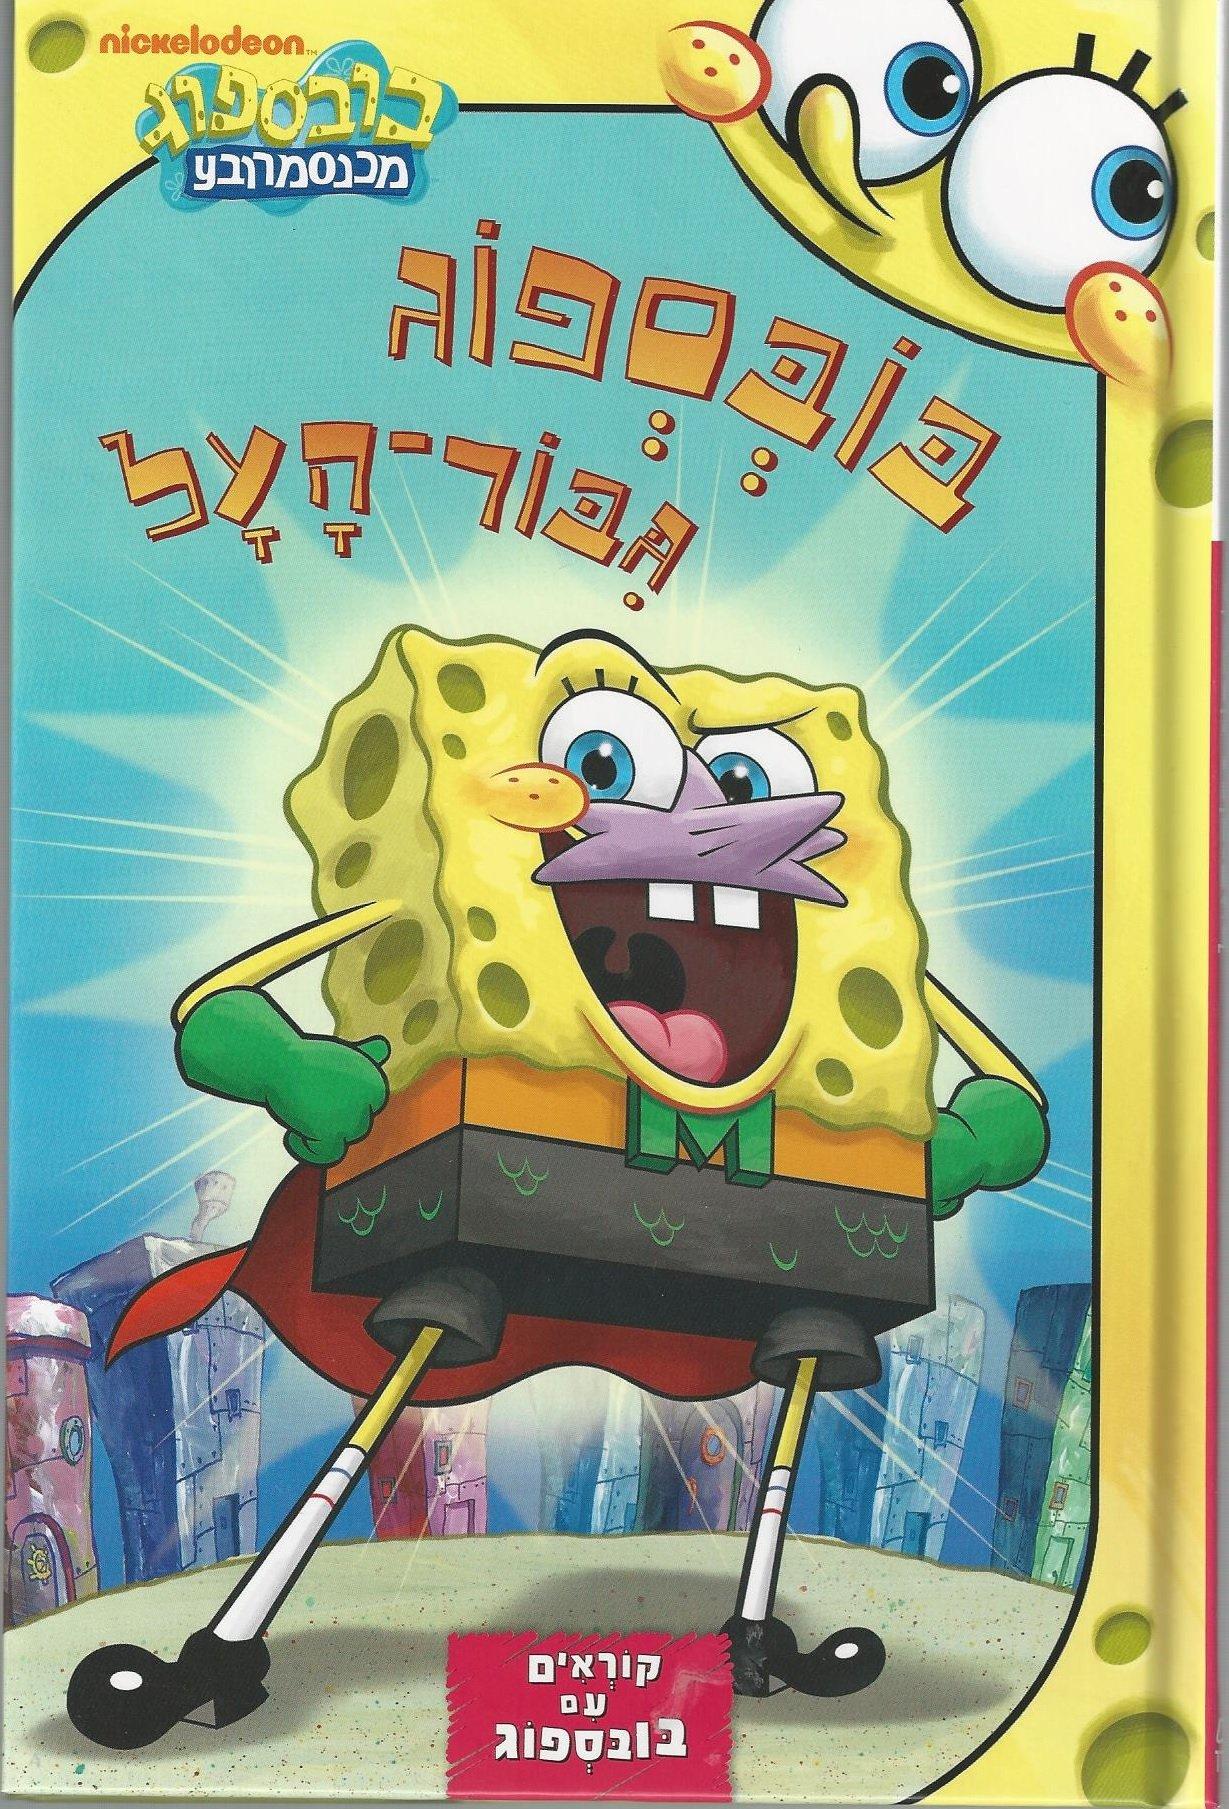 Read Online Spongebob Squarepants - Hebrew Book for Kids - Man Sponge Saves the Day pdf epub